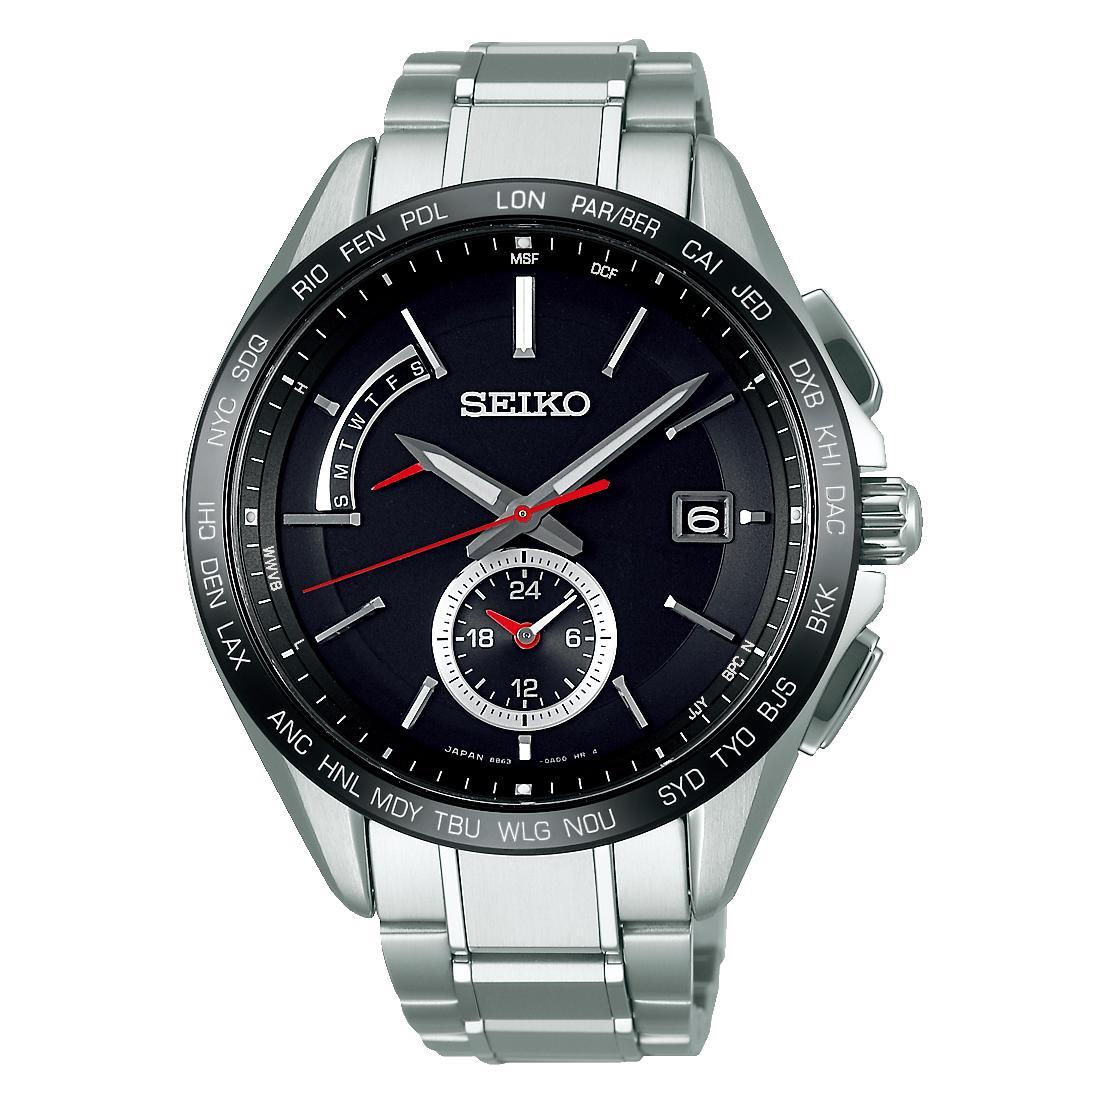 SEIKO セイコー BRIGHTZ ブライツSAGA241 ソーラー電波時計【正規販売店】